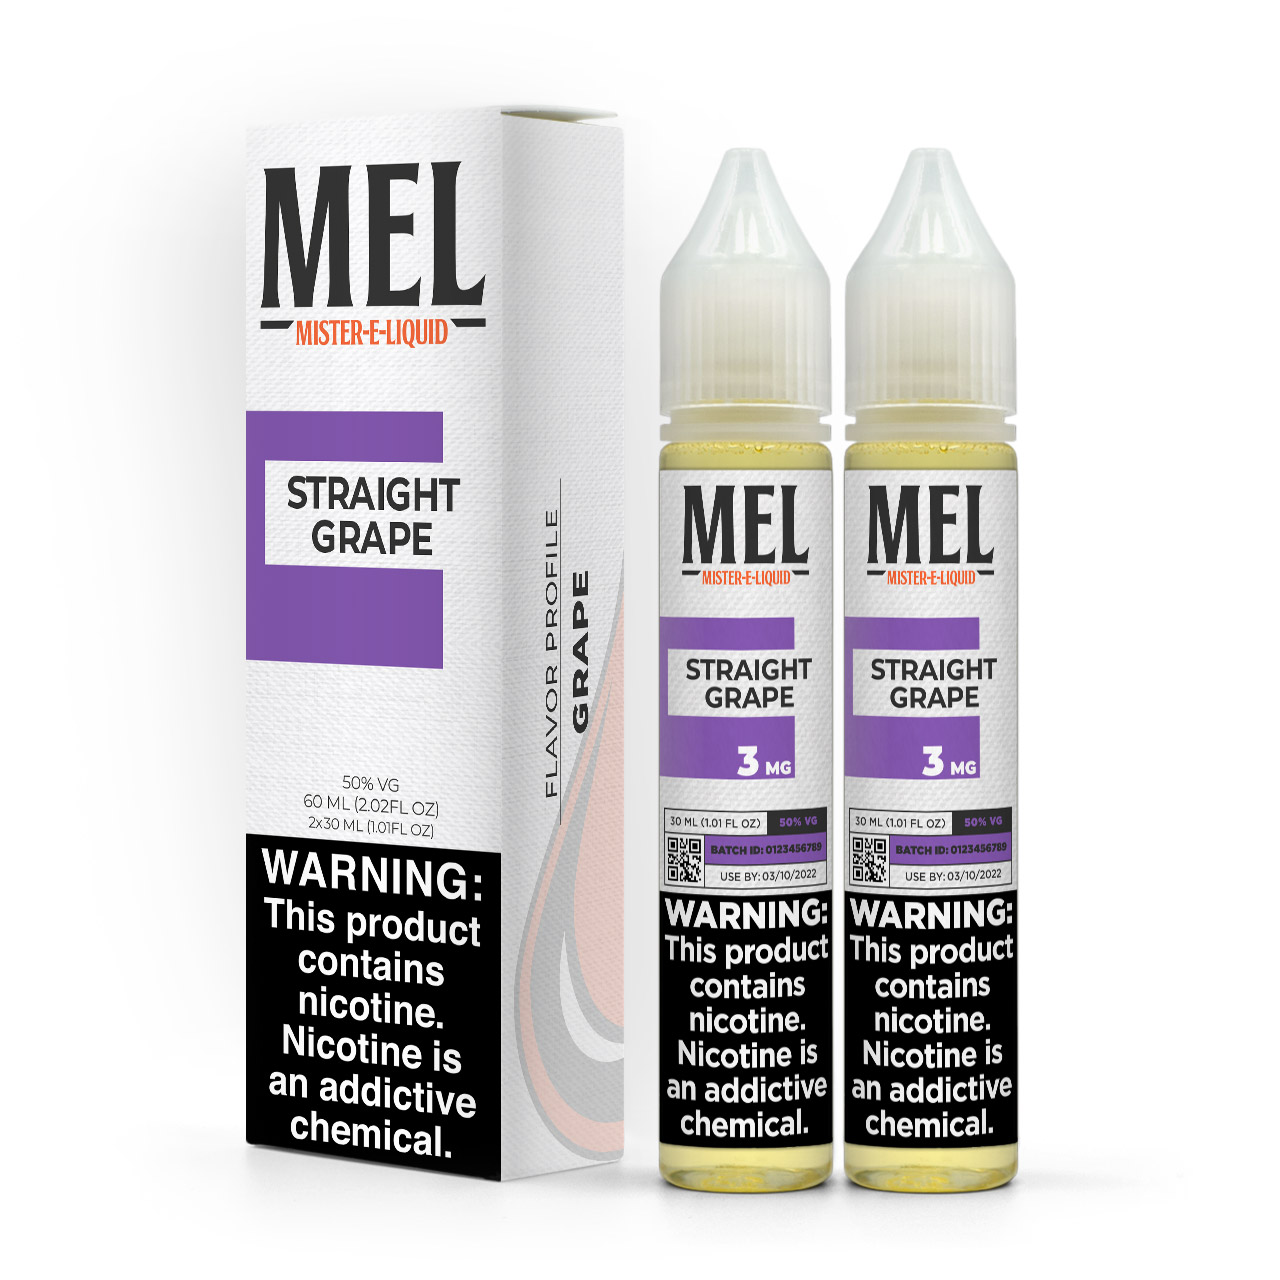 MEL Straight Grape vape juice, in 60 ml bundle